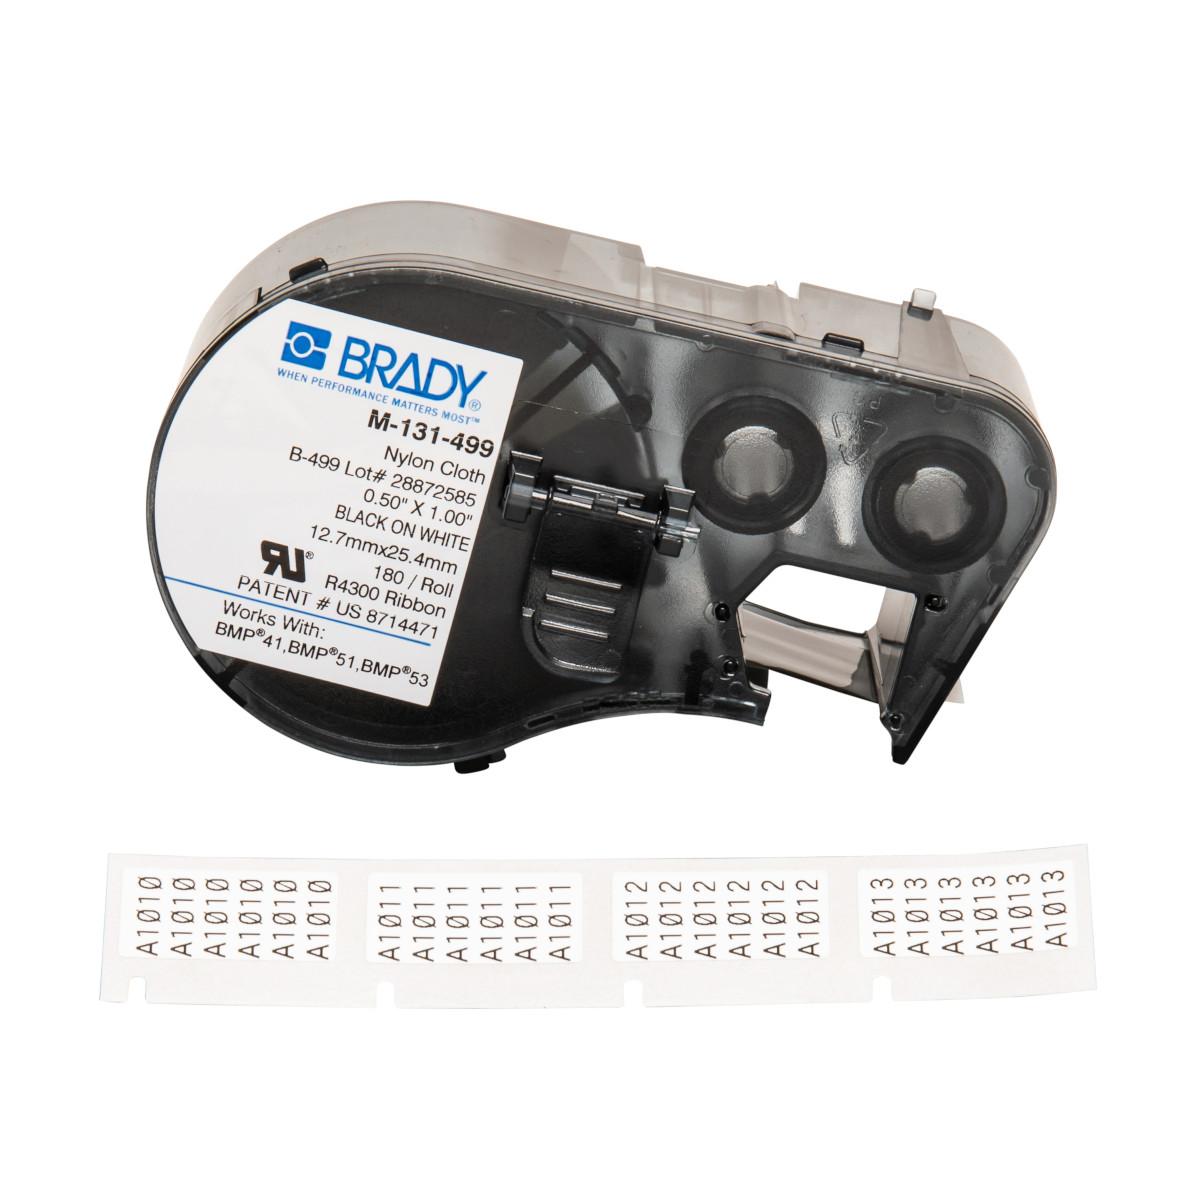 Brady Part M 131 499 143350 51 53 41 Nylon Cloth Home Bmp21 Hand Held Label Printer Electrical Kit Labels